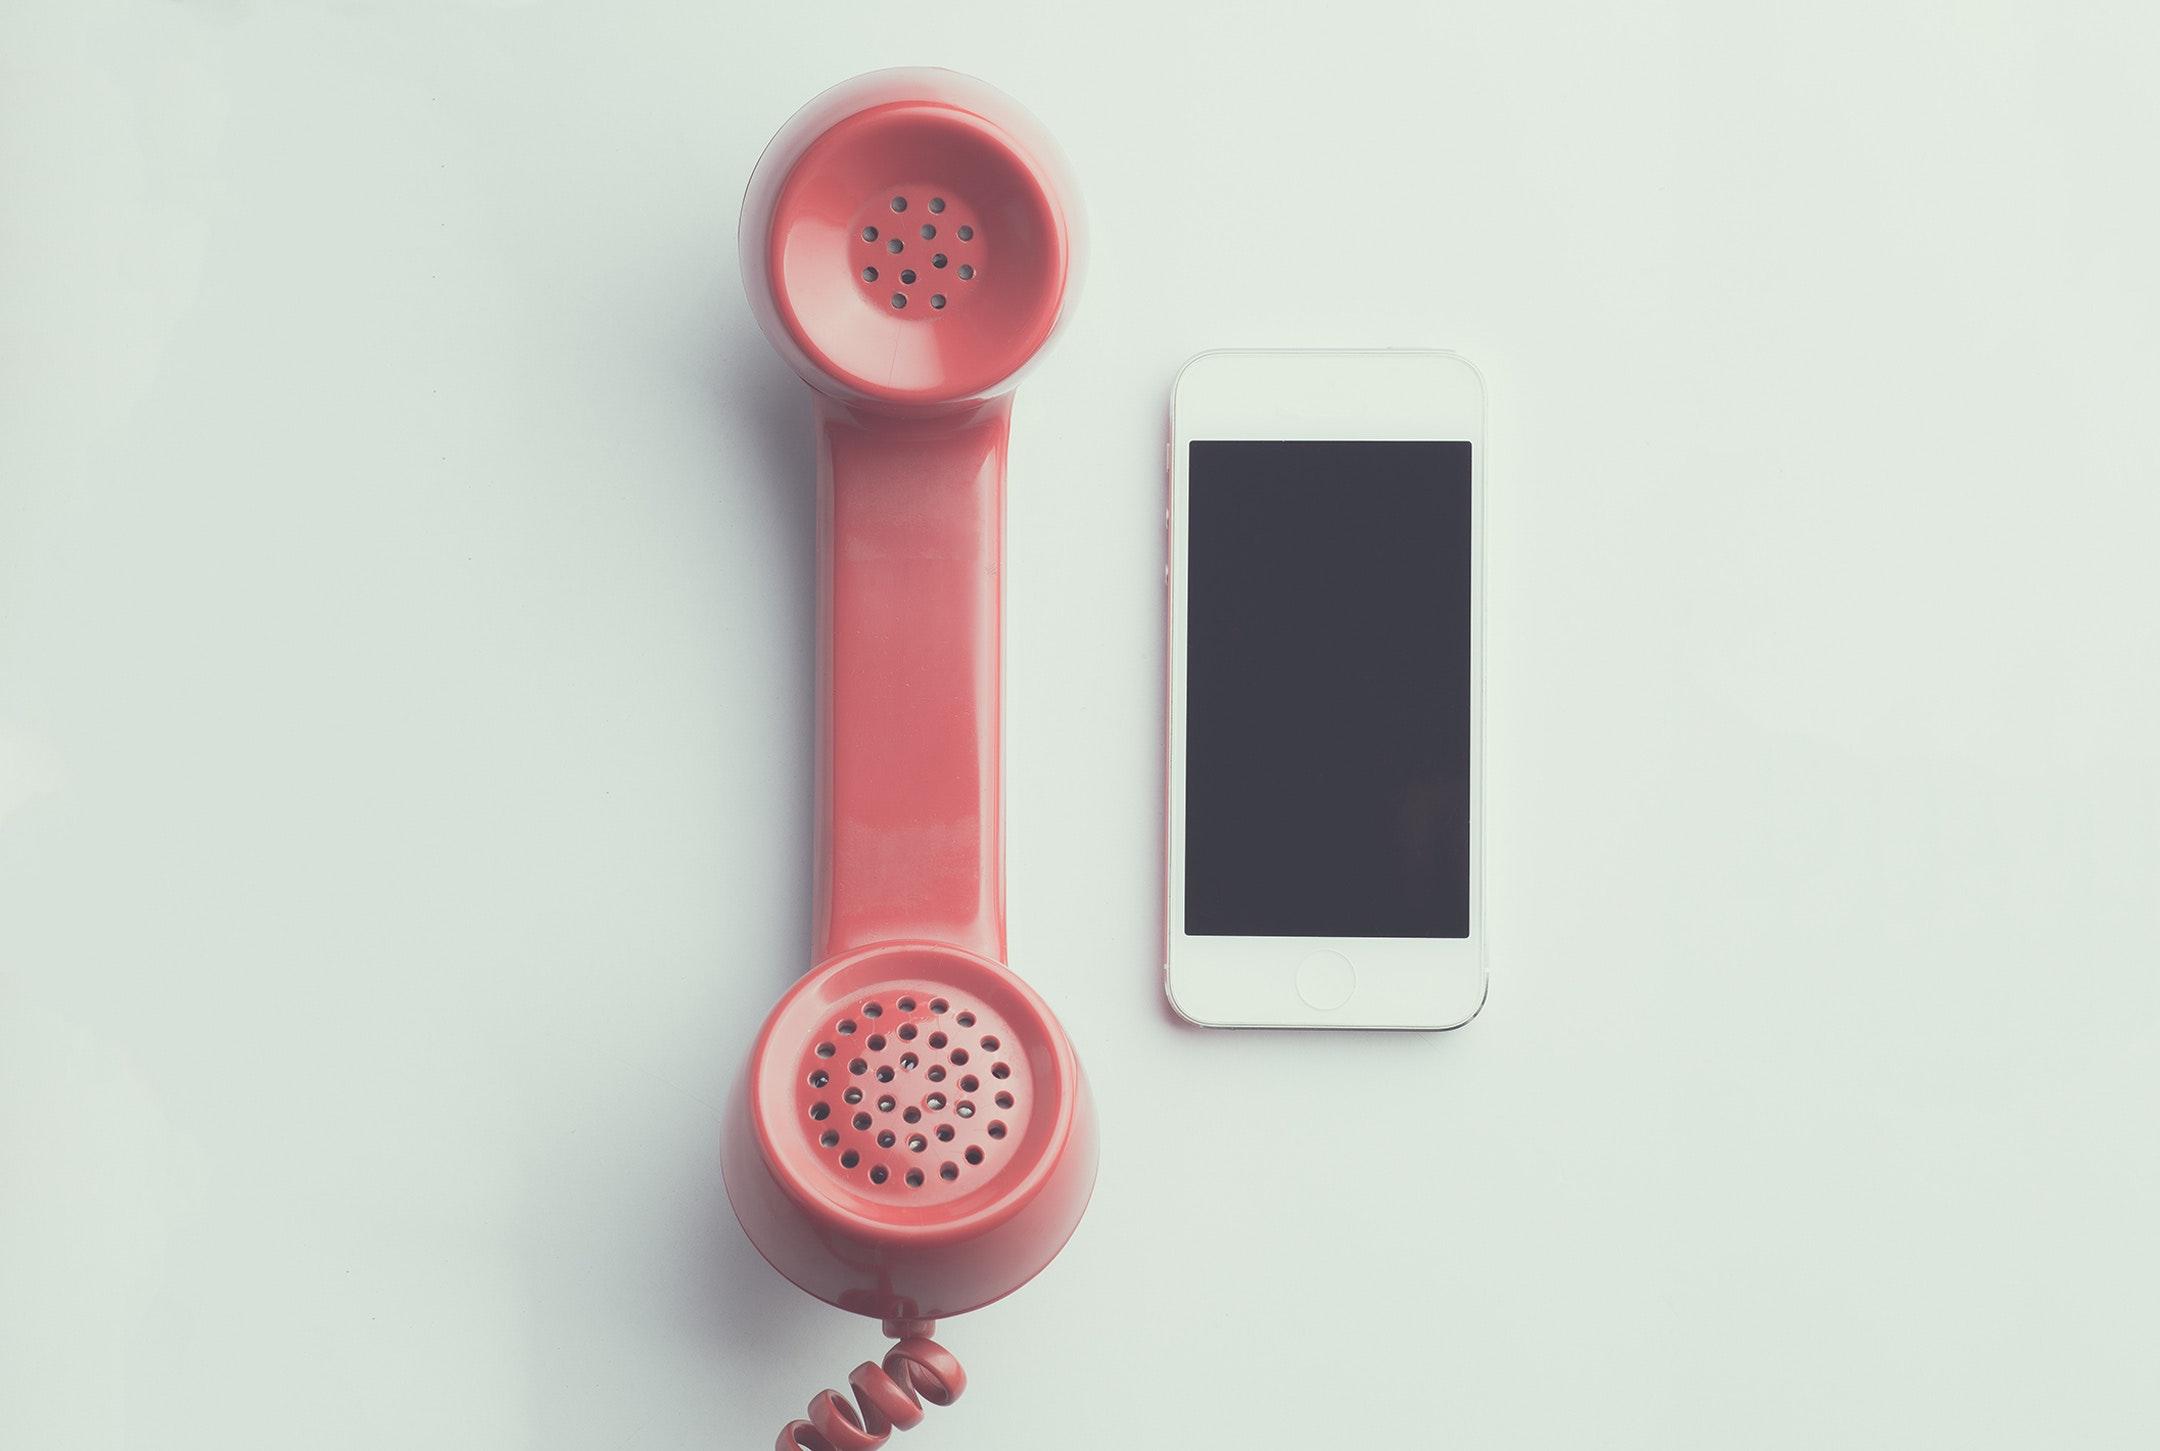 apple-device-cellphone-communication-device-594452 (1)